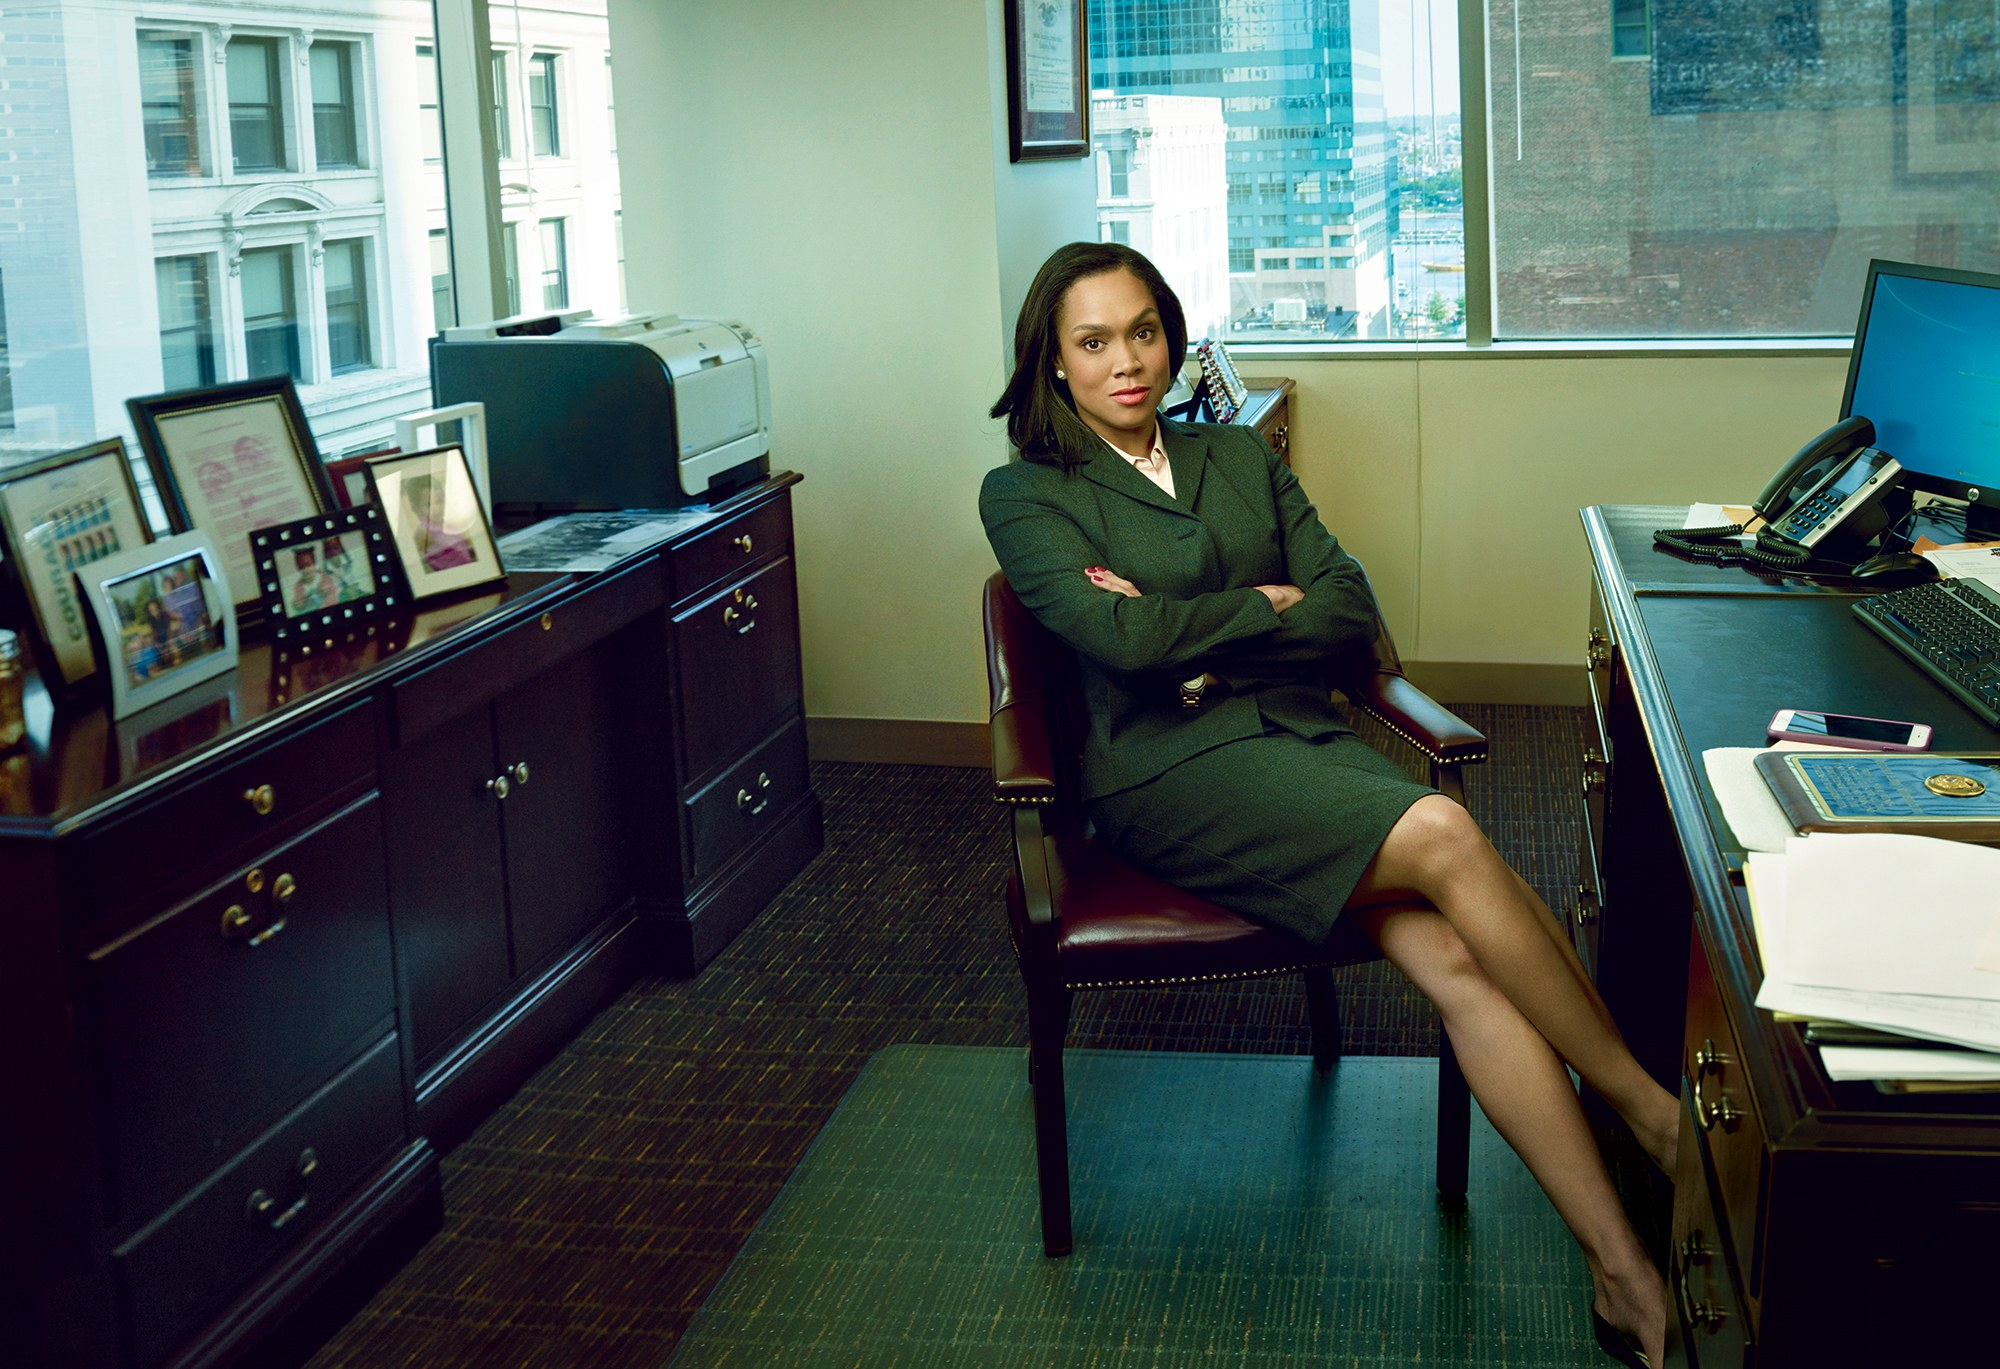 marilyn-mosby-baltimore-prosecutor.jpg